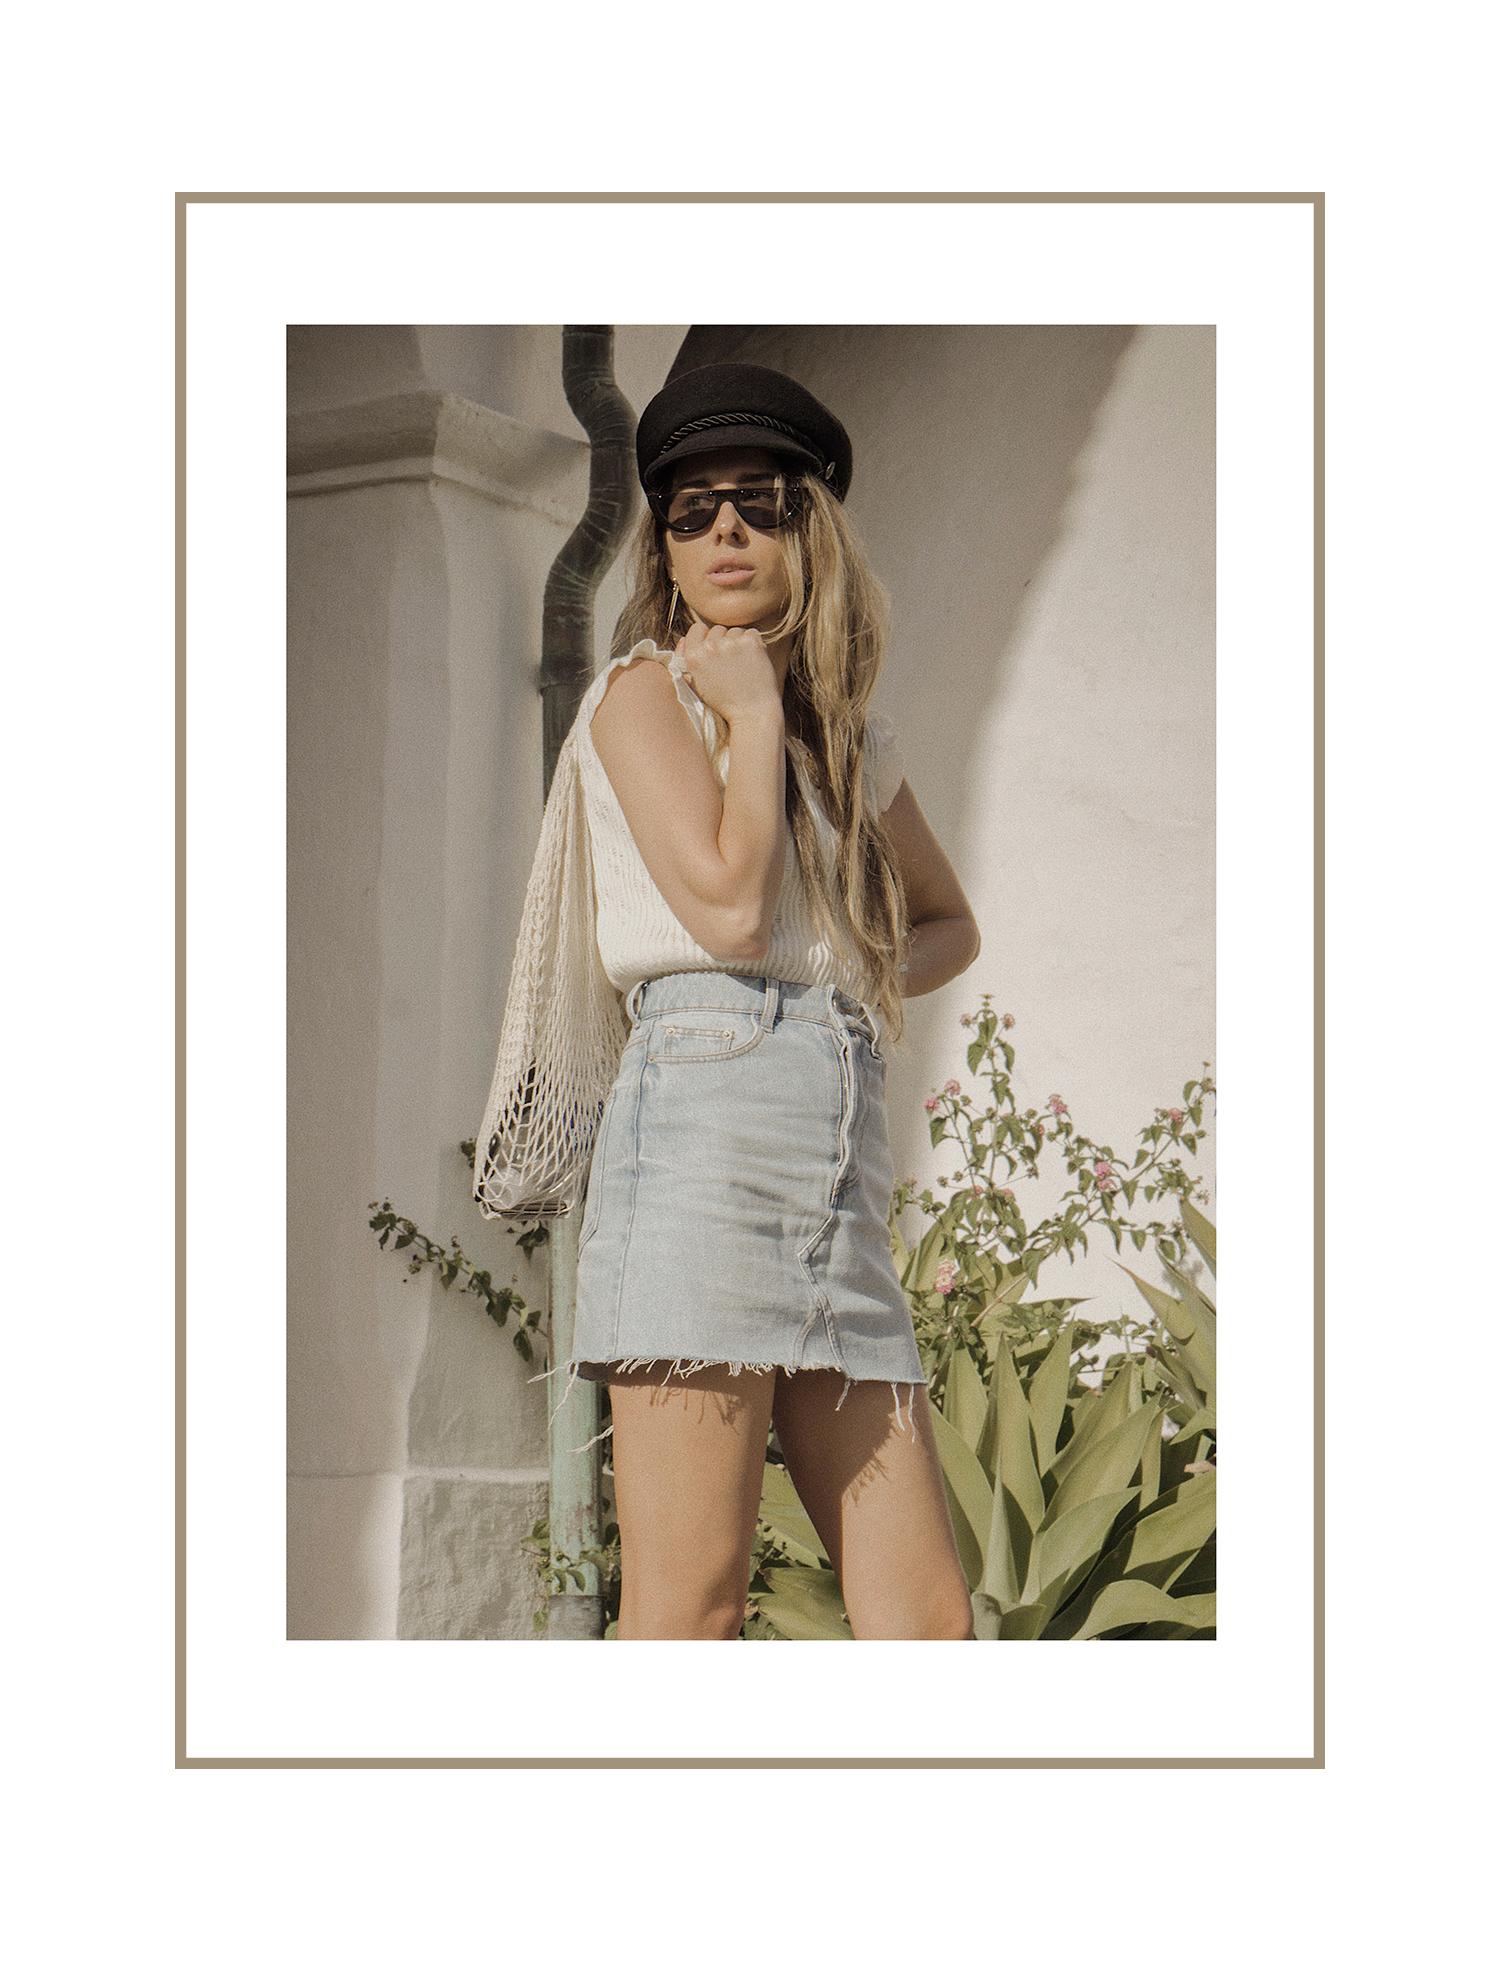 santa_barbara_street_style_denim)skirt_summer_outfit_cap_net_bag_ternd_2018_lena_juice_thewhiteocean_01